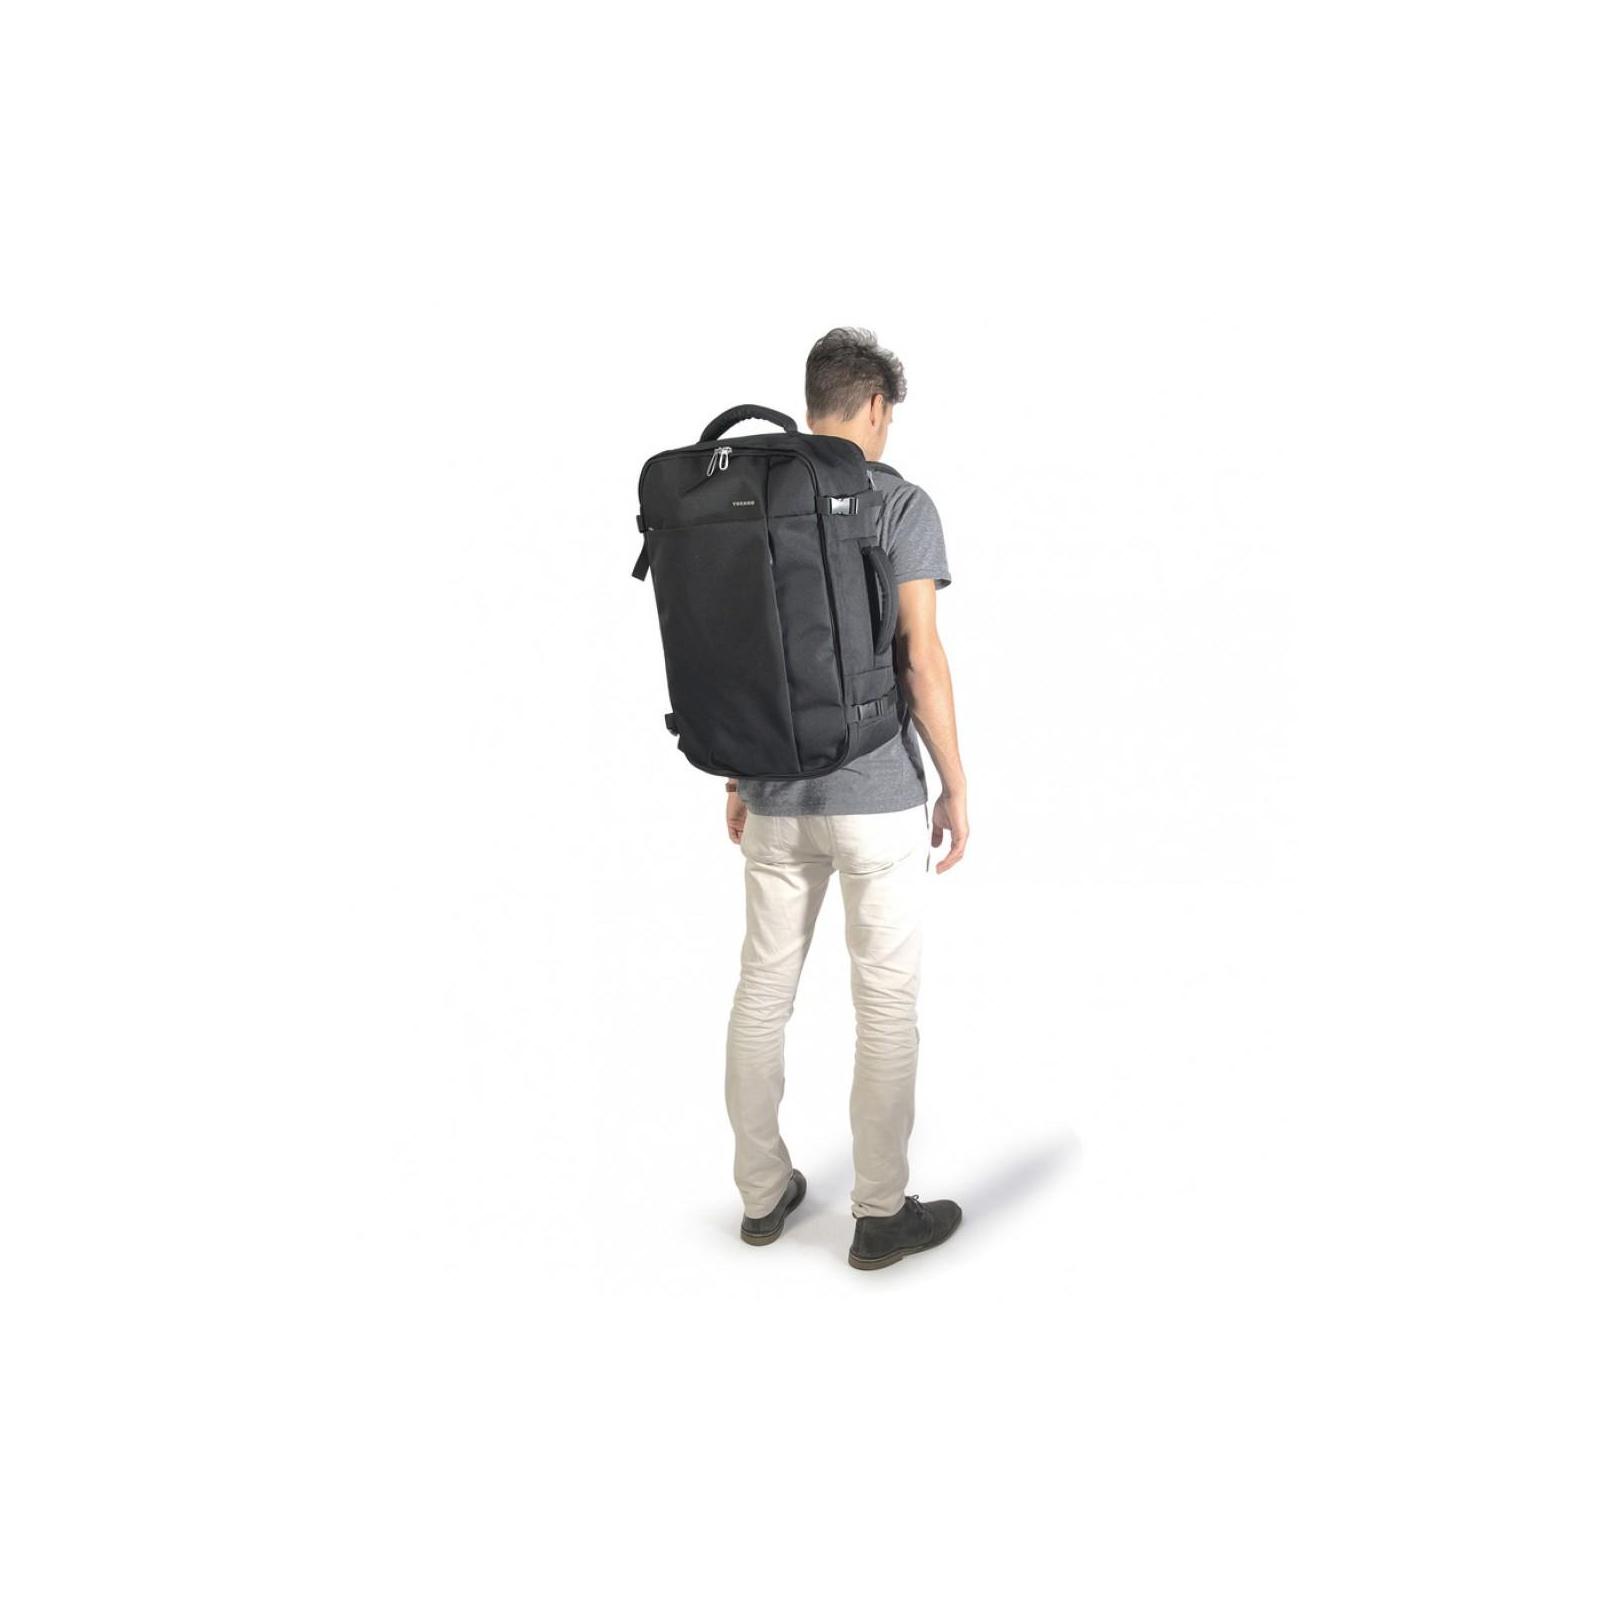 "Рюкзак для ноутбука Tucano 17.3"" TUGO' L CABIN black (BKTUG-L-BK) изображение 8"